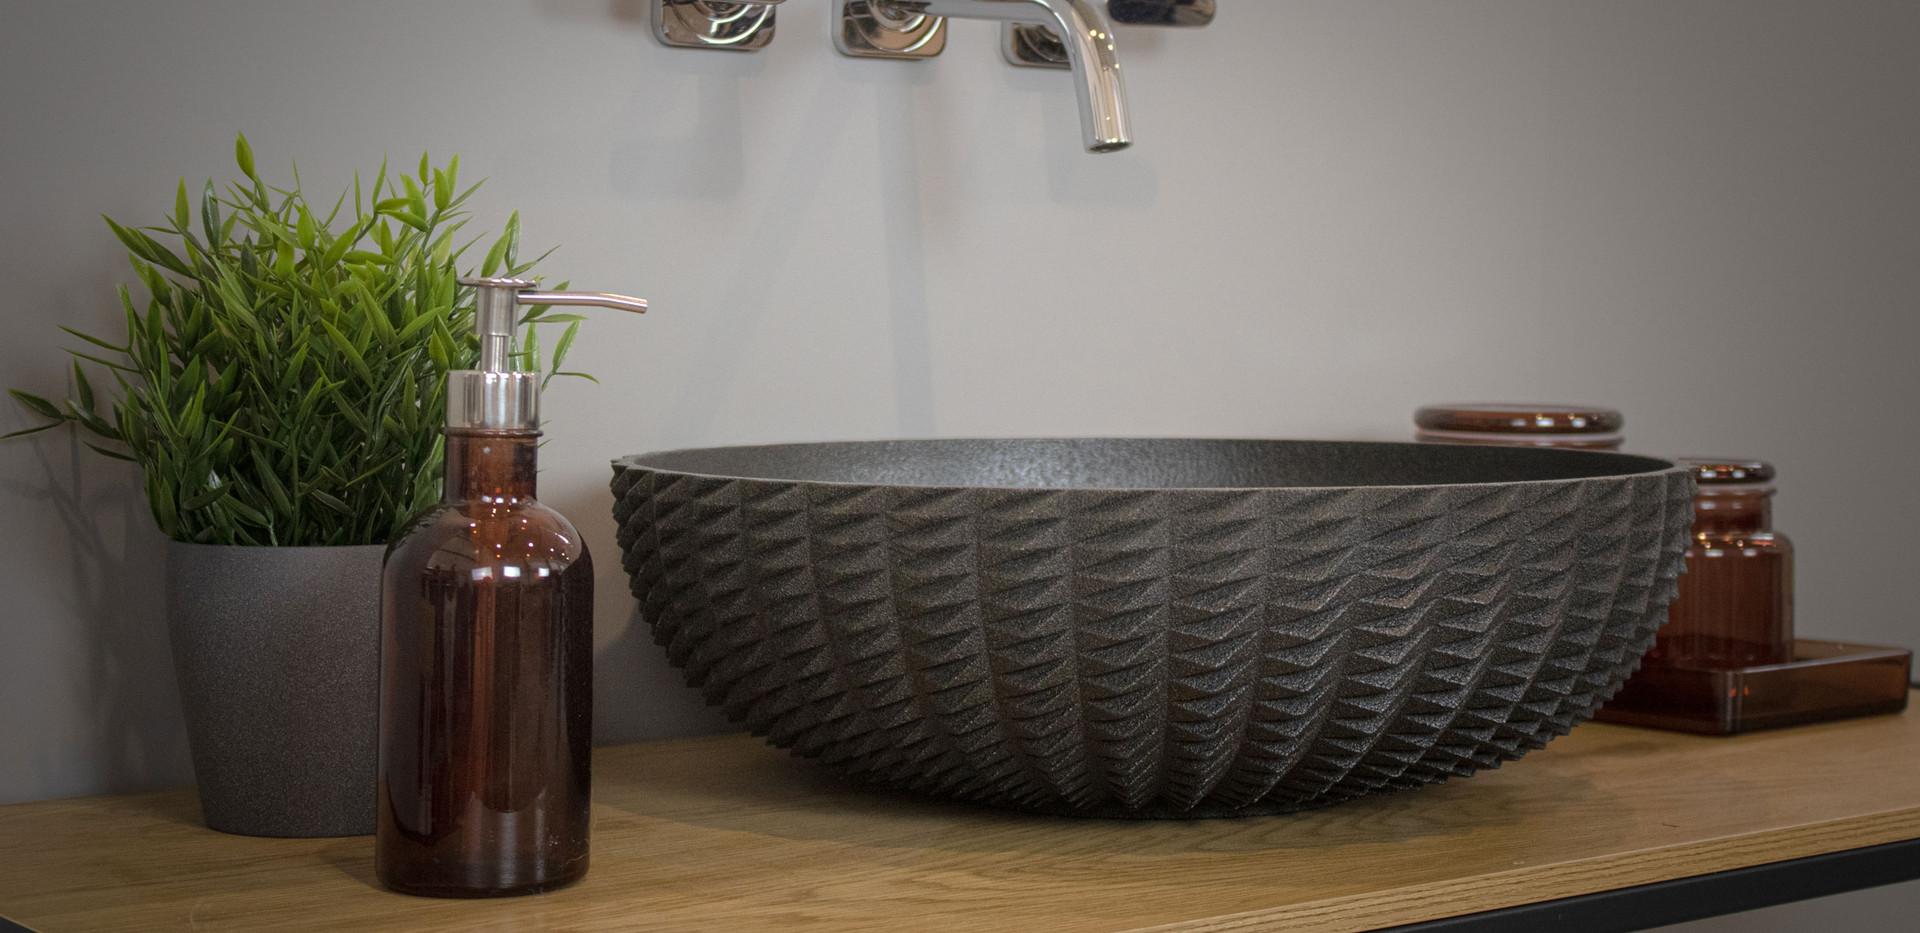 washbasin-jag-rough-stone-cover.jpg